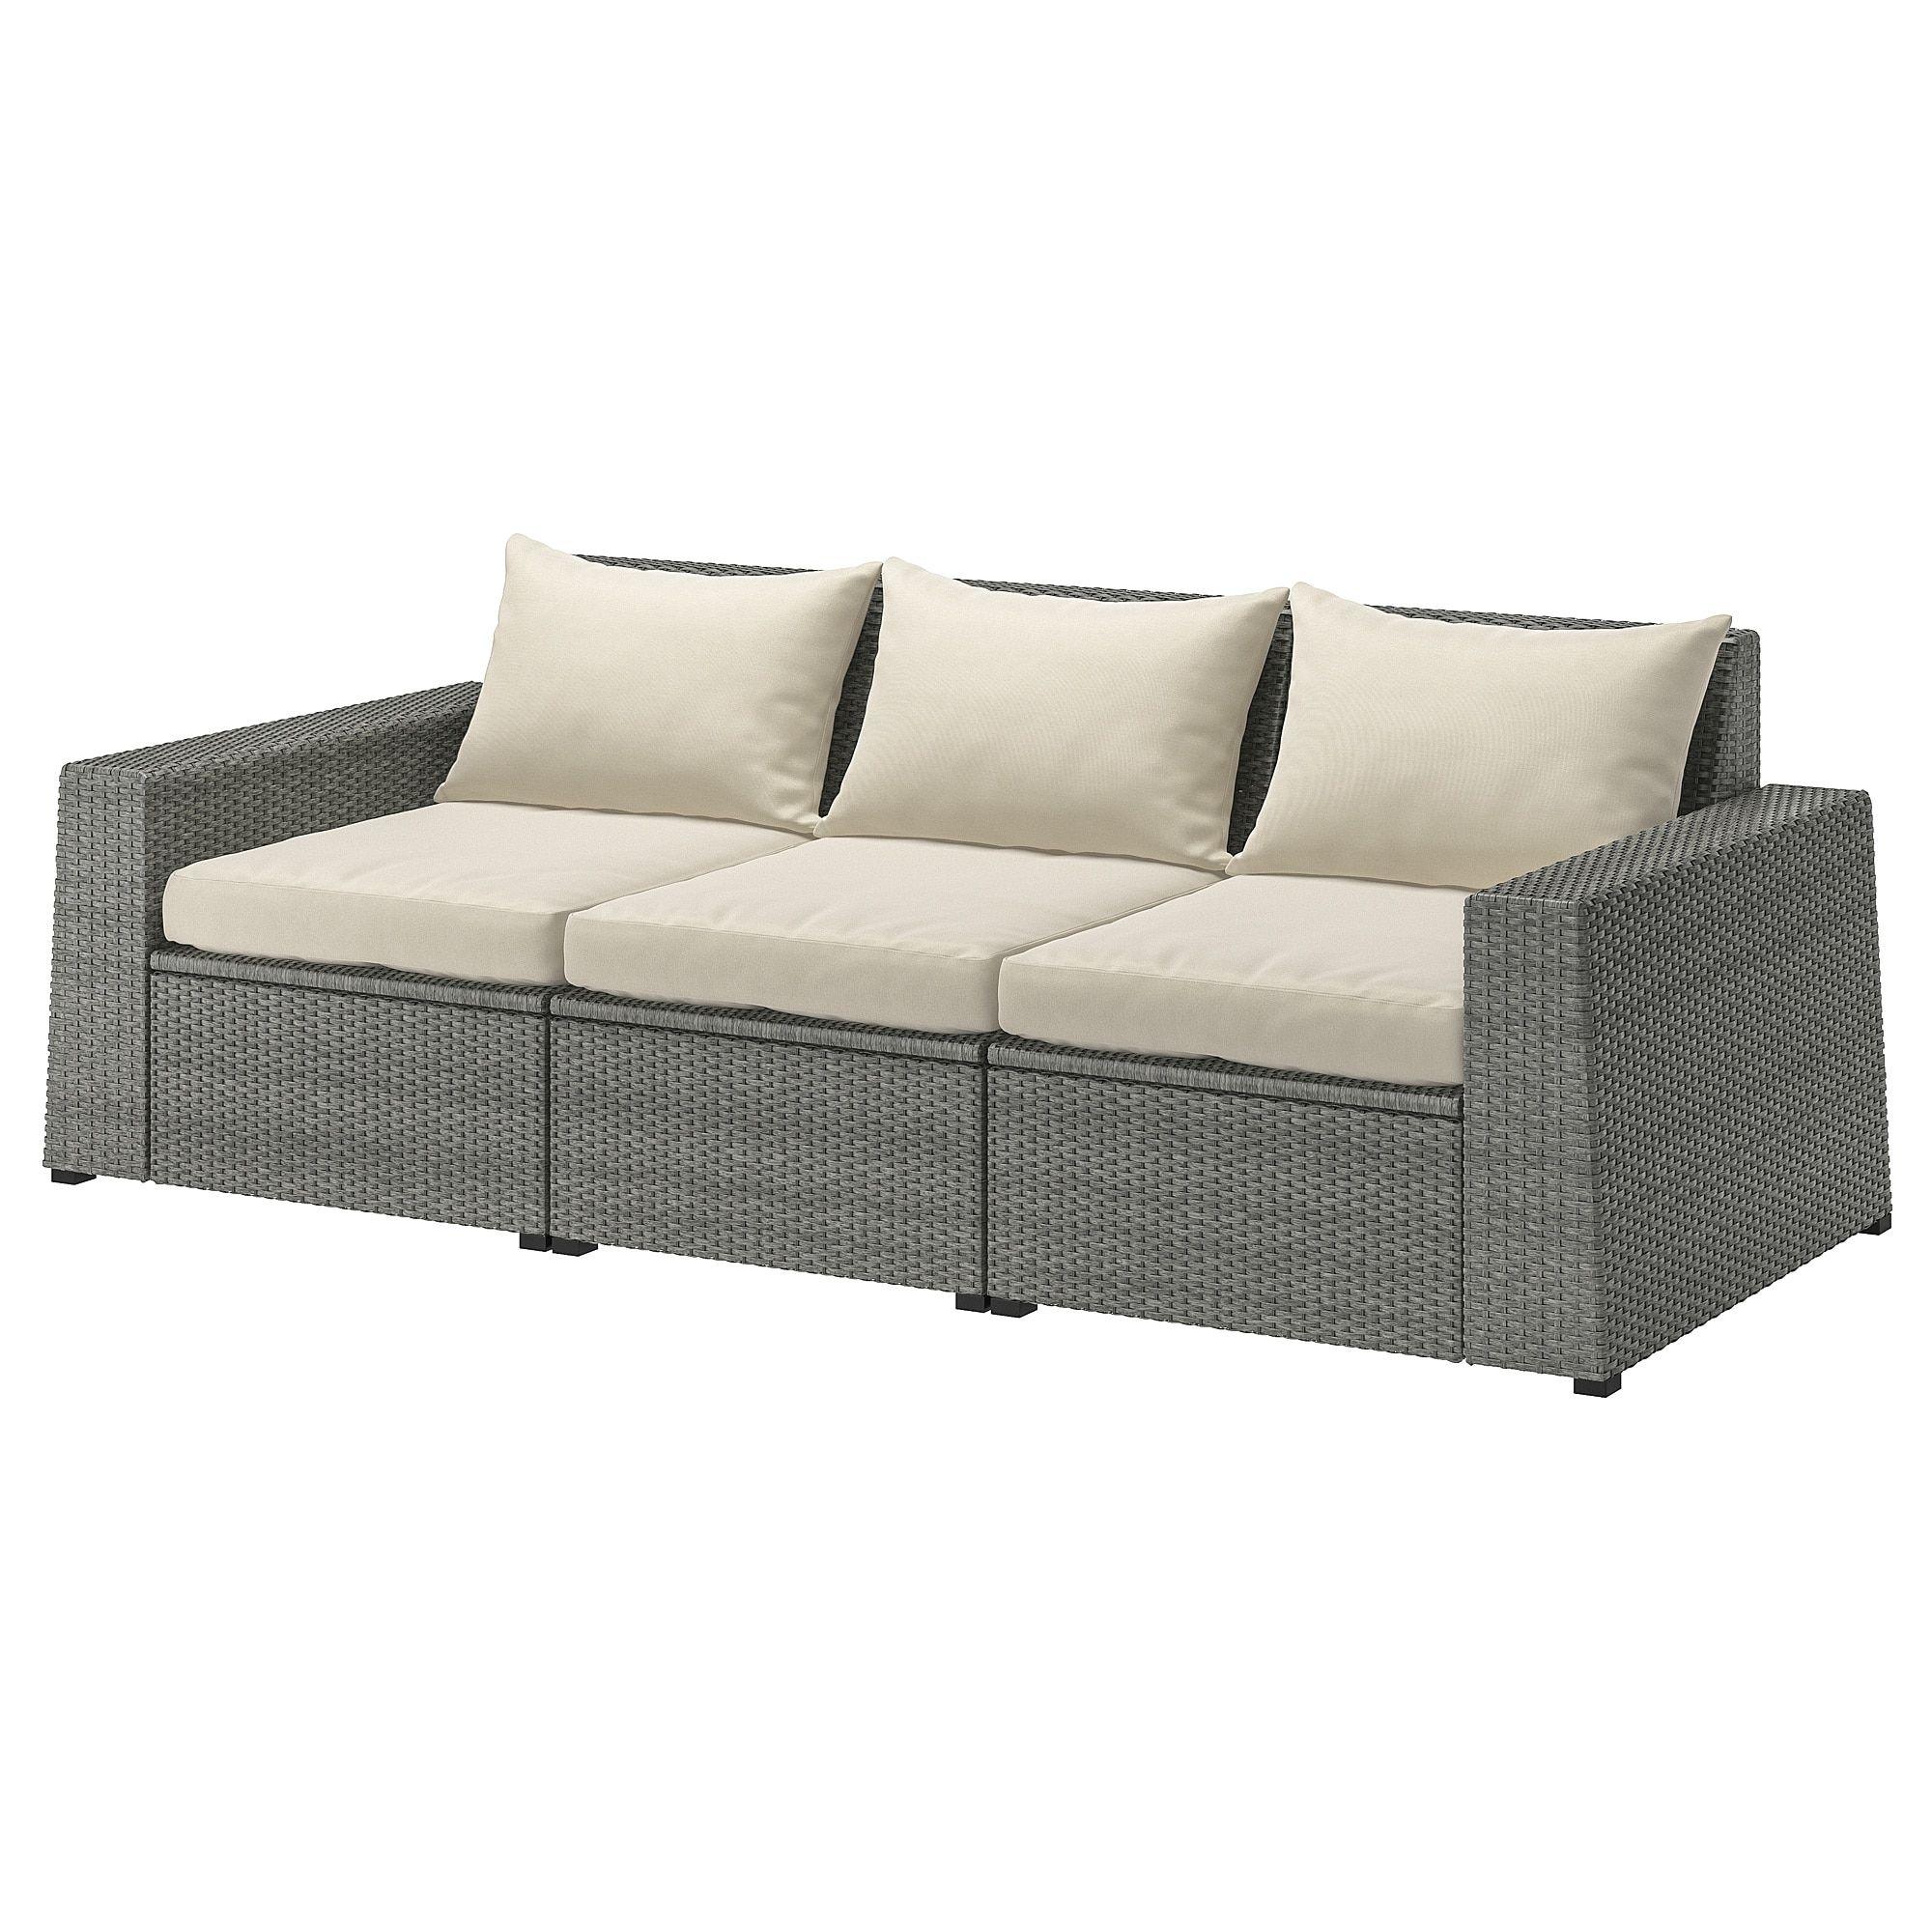 Us Furniture And Home Furnishings Modular Sofa Modular Corner Sofa Outdoor Seat Pads